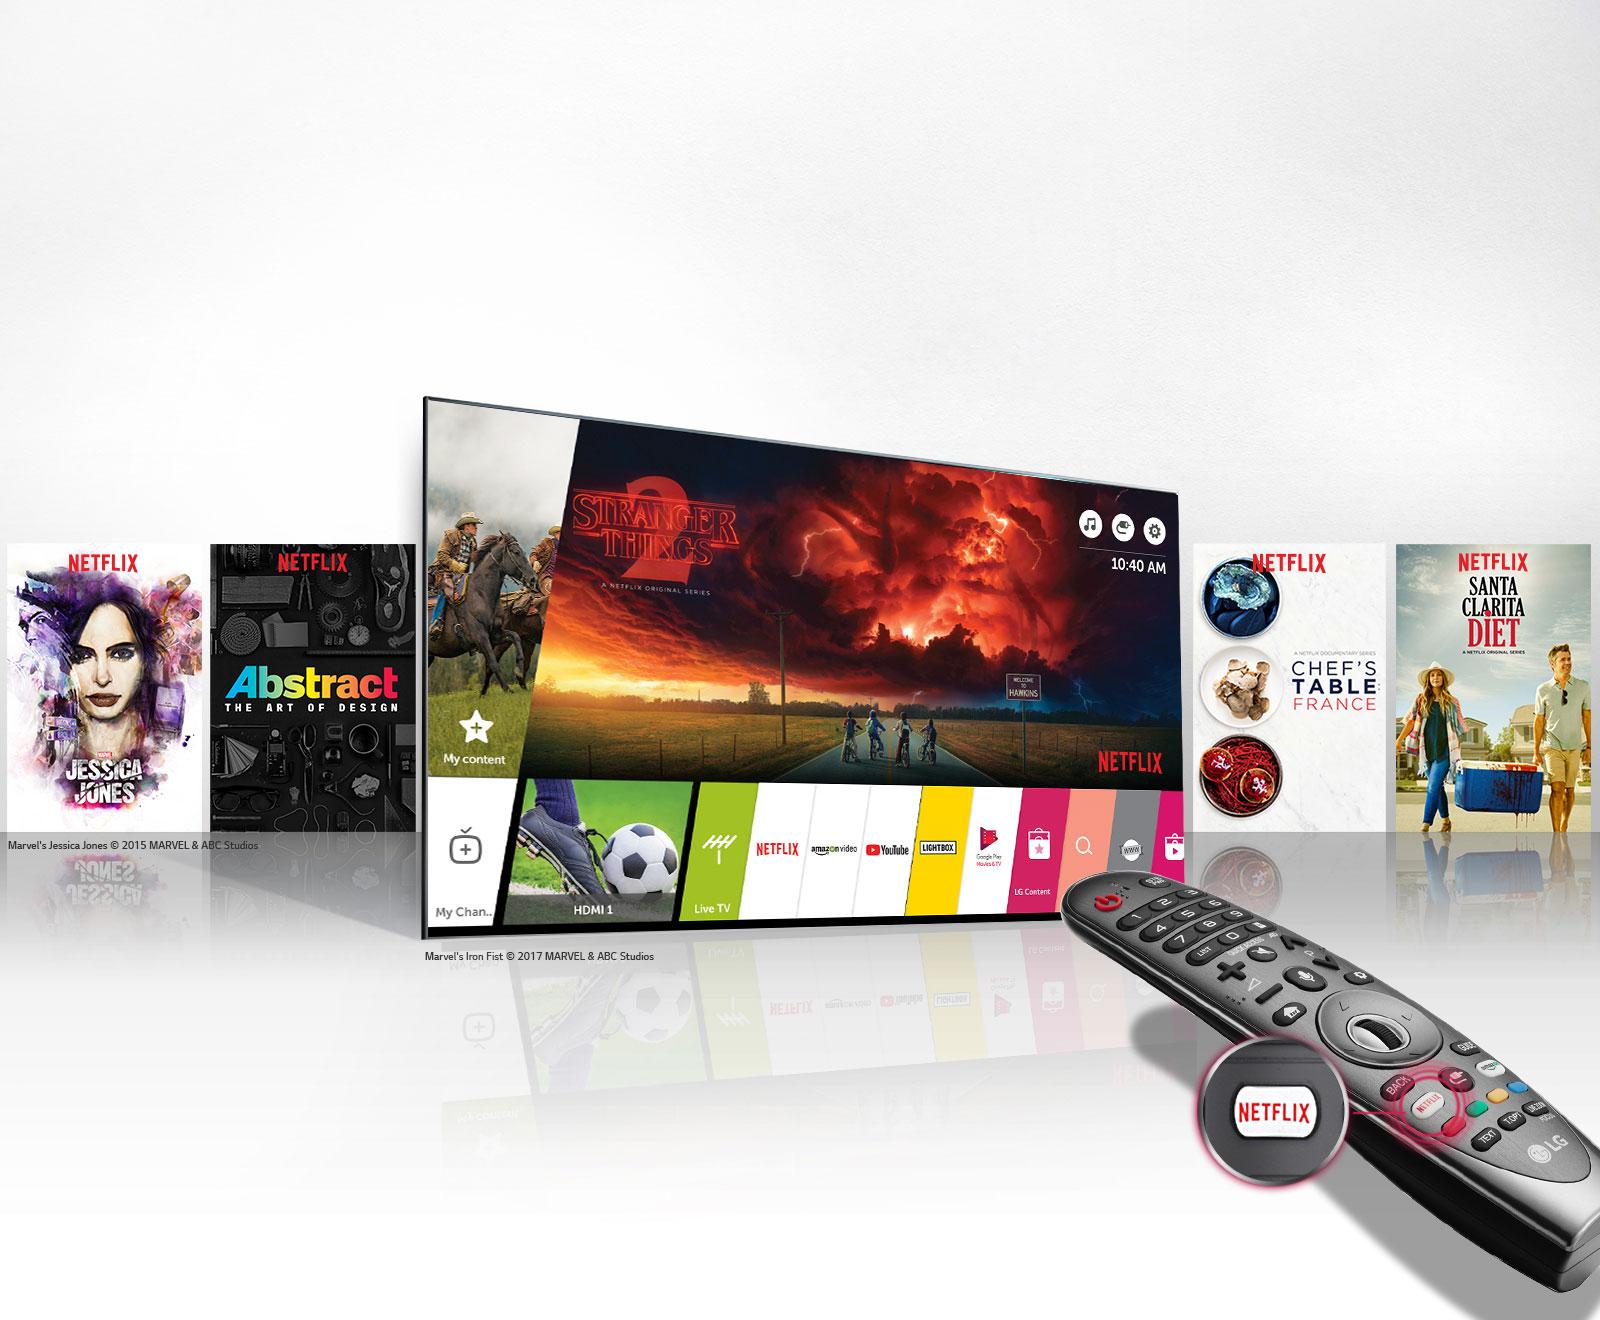 webOS_Smart_TV_Netflix_D_V1